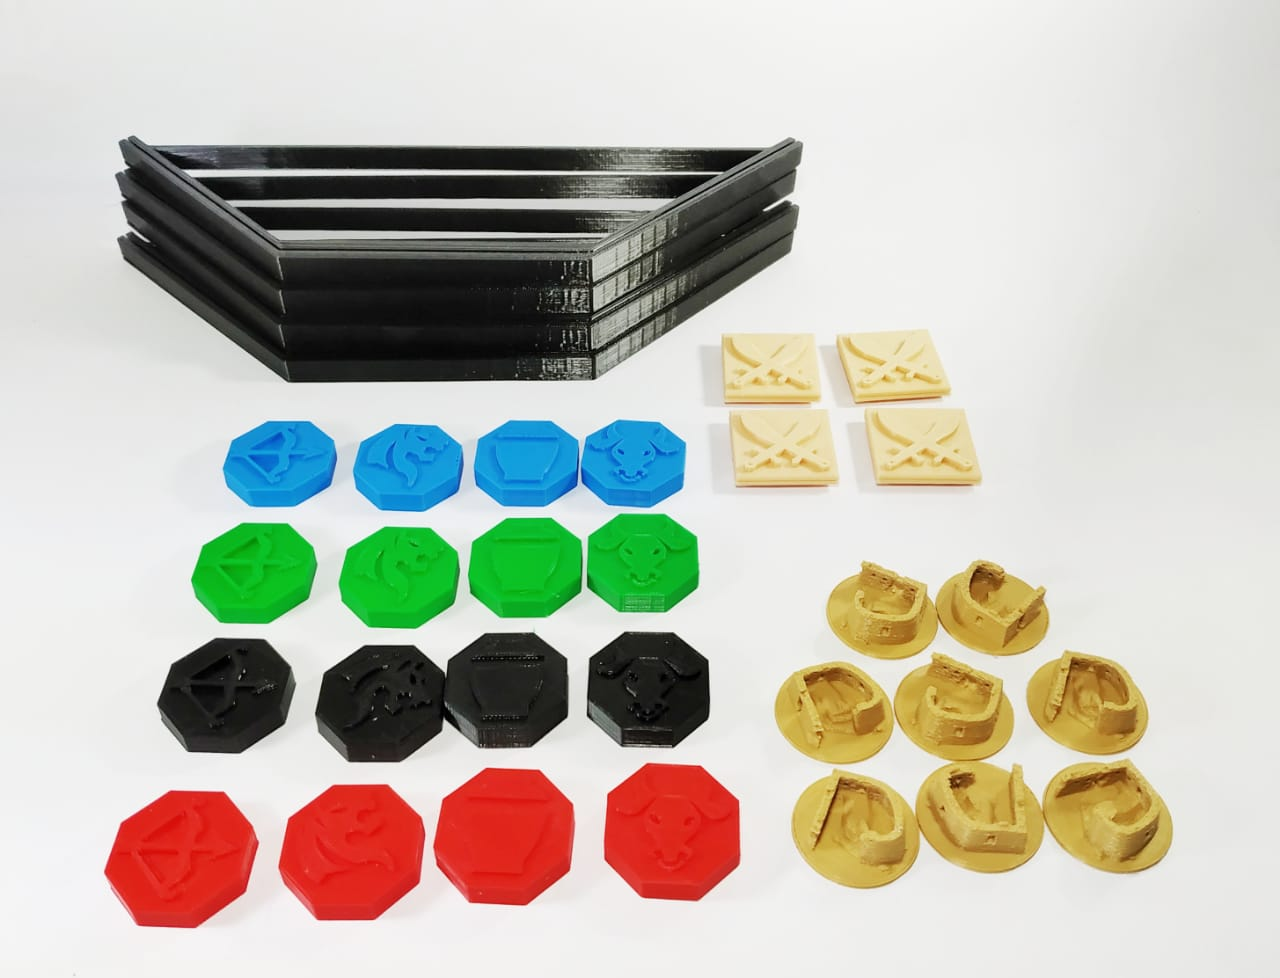 Tigris e Euphrates Kit de peças 3D realistas Acessório Jogo de Tabuleiro  - Place Games